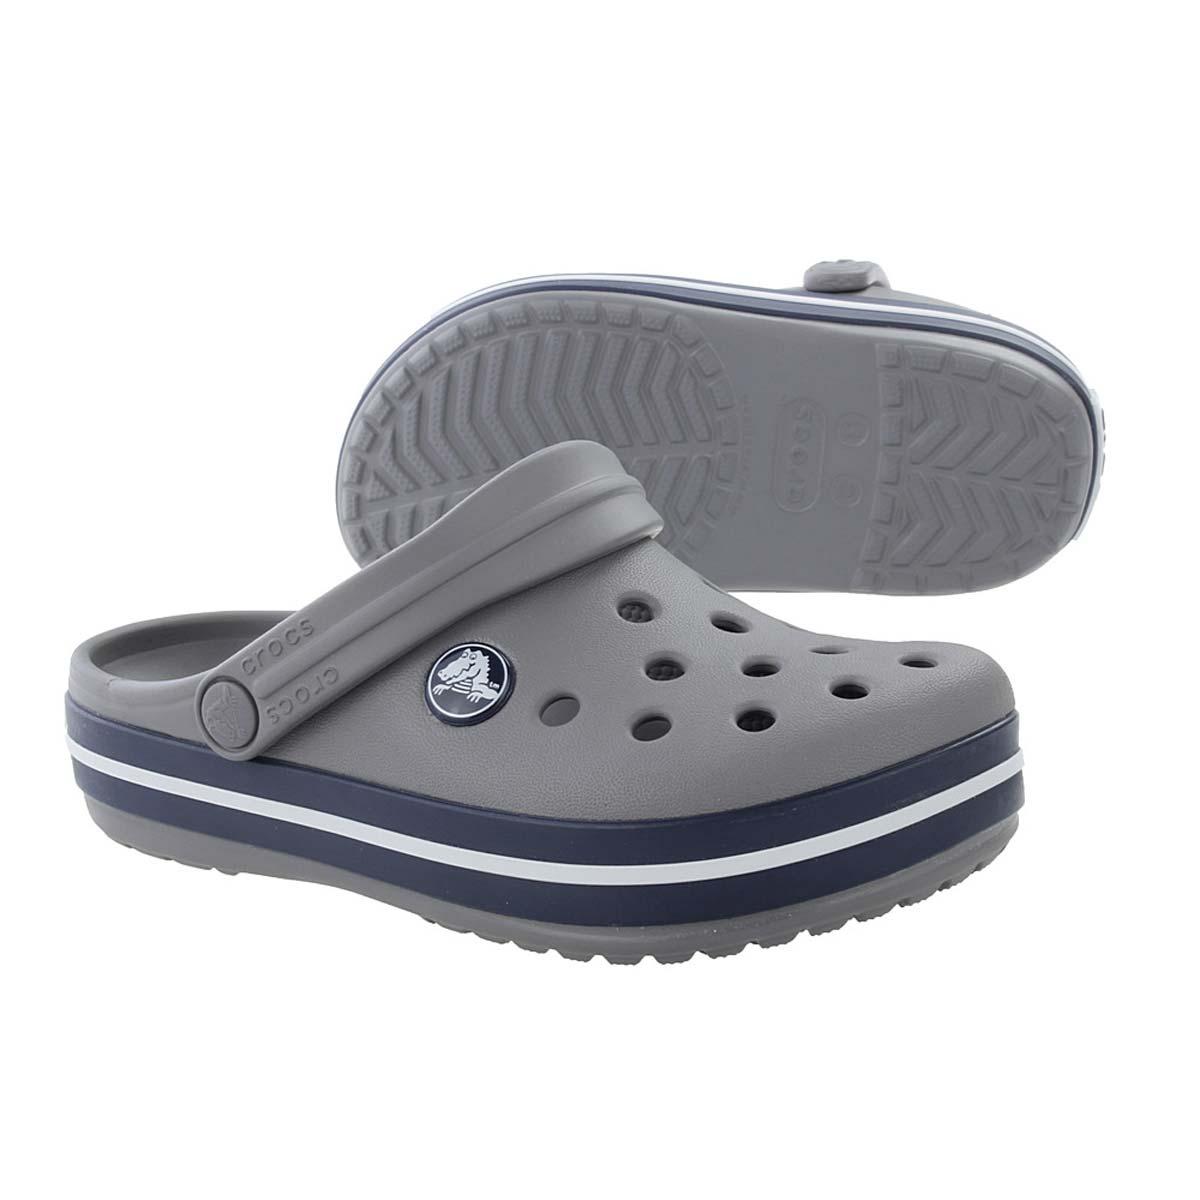 cf8de4afe6f06 Crocs Crocband K Kids Clog (Smoke/Navy)